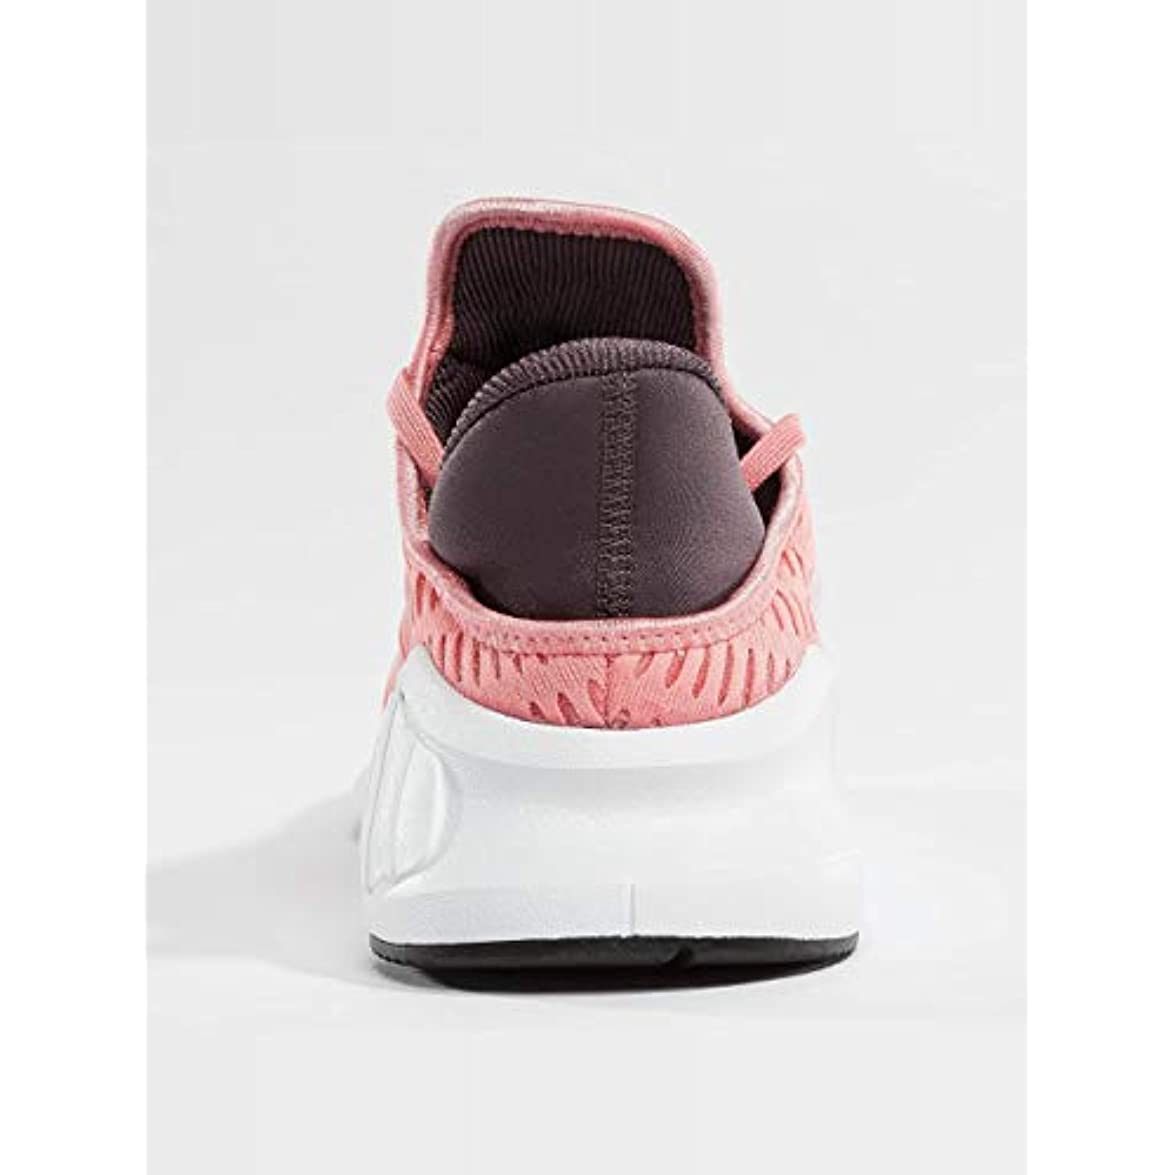 Adidas Climacool 02 17 W Scarpe Da Ginnastica Basse Donna